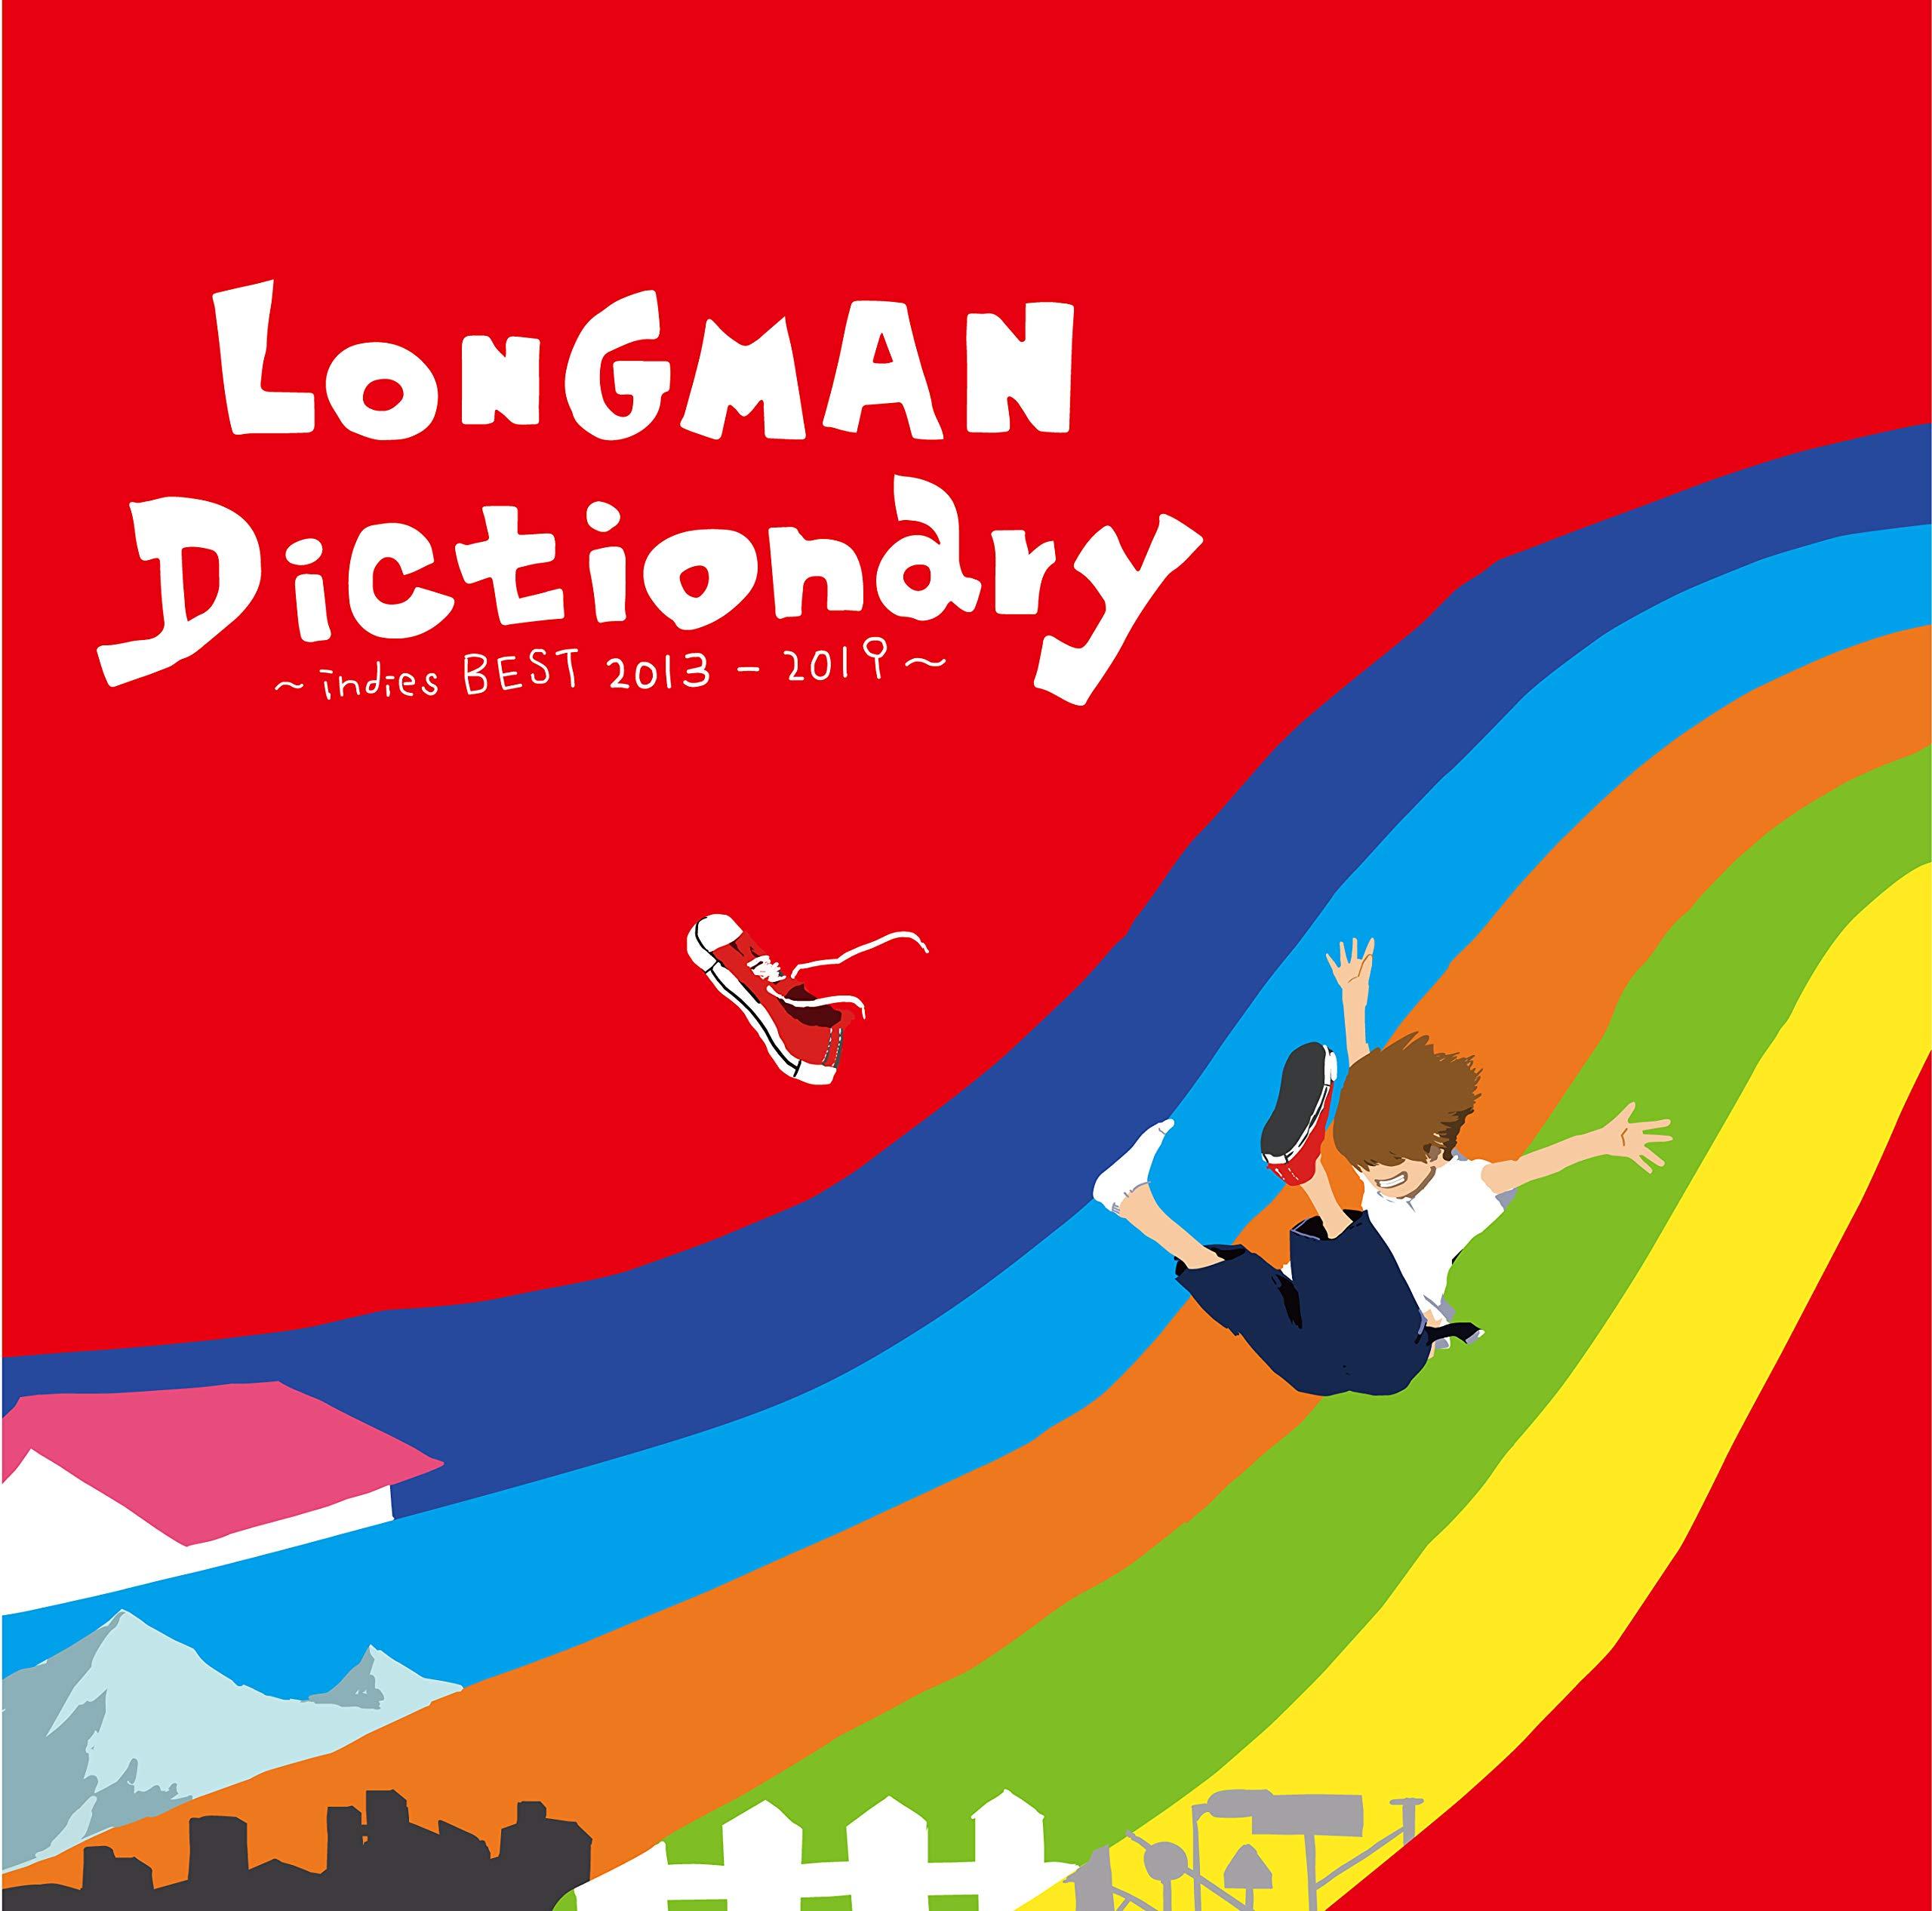 LONGMAN – Dictionary ~indies BEST 2013-2019~ [FLAC / CD] [2019.06.12]